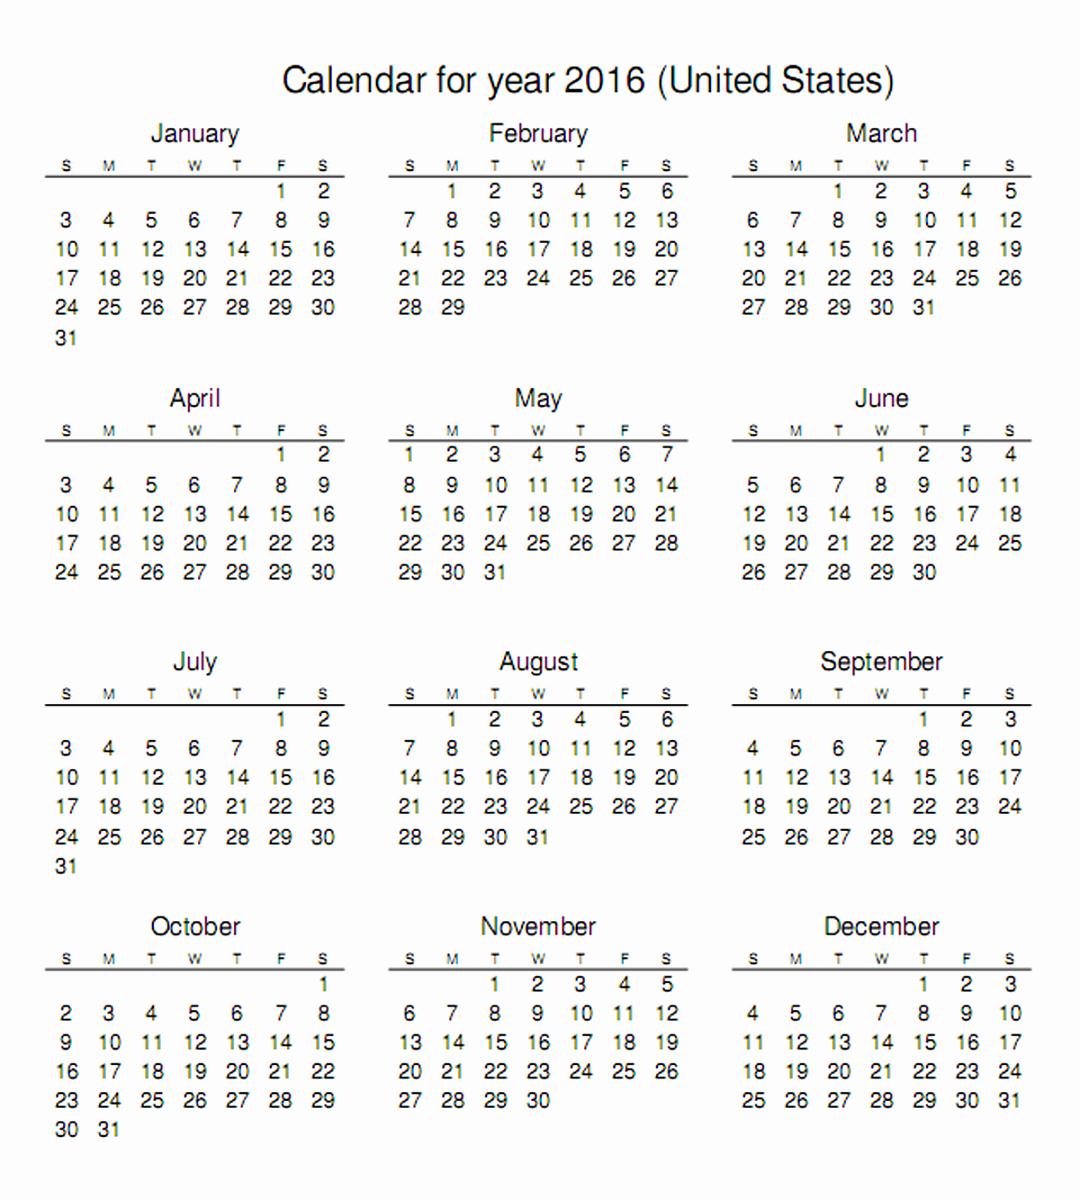 Free Downloadable 2016 Calendar Template Best Of 2016 Calendar Printable E Page